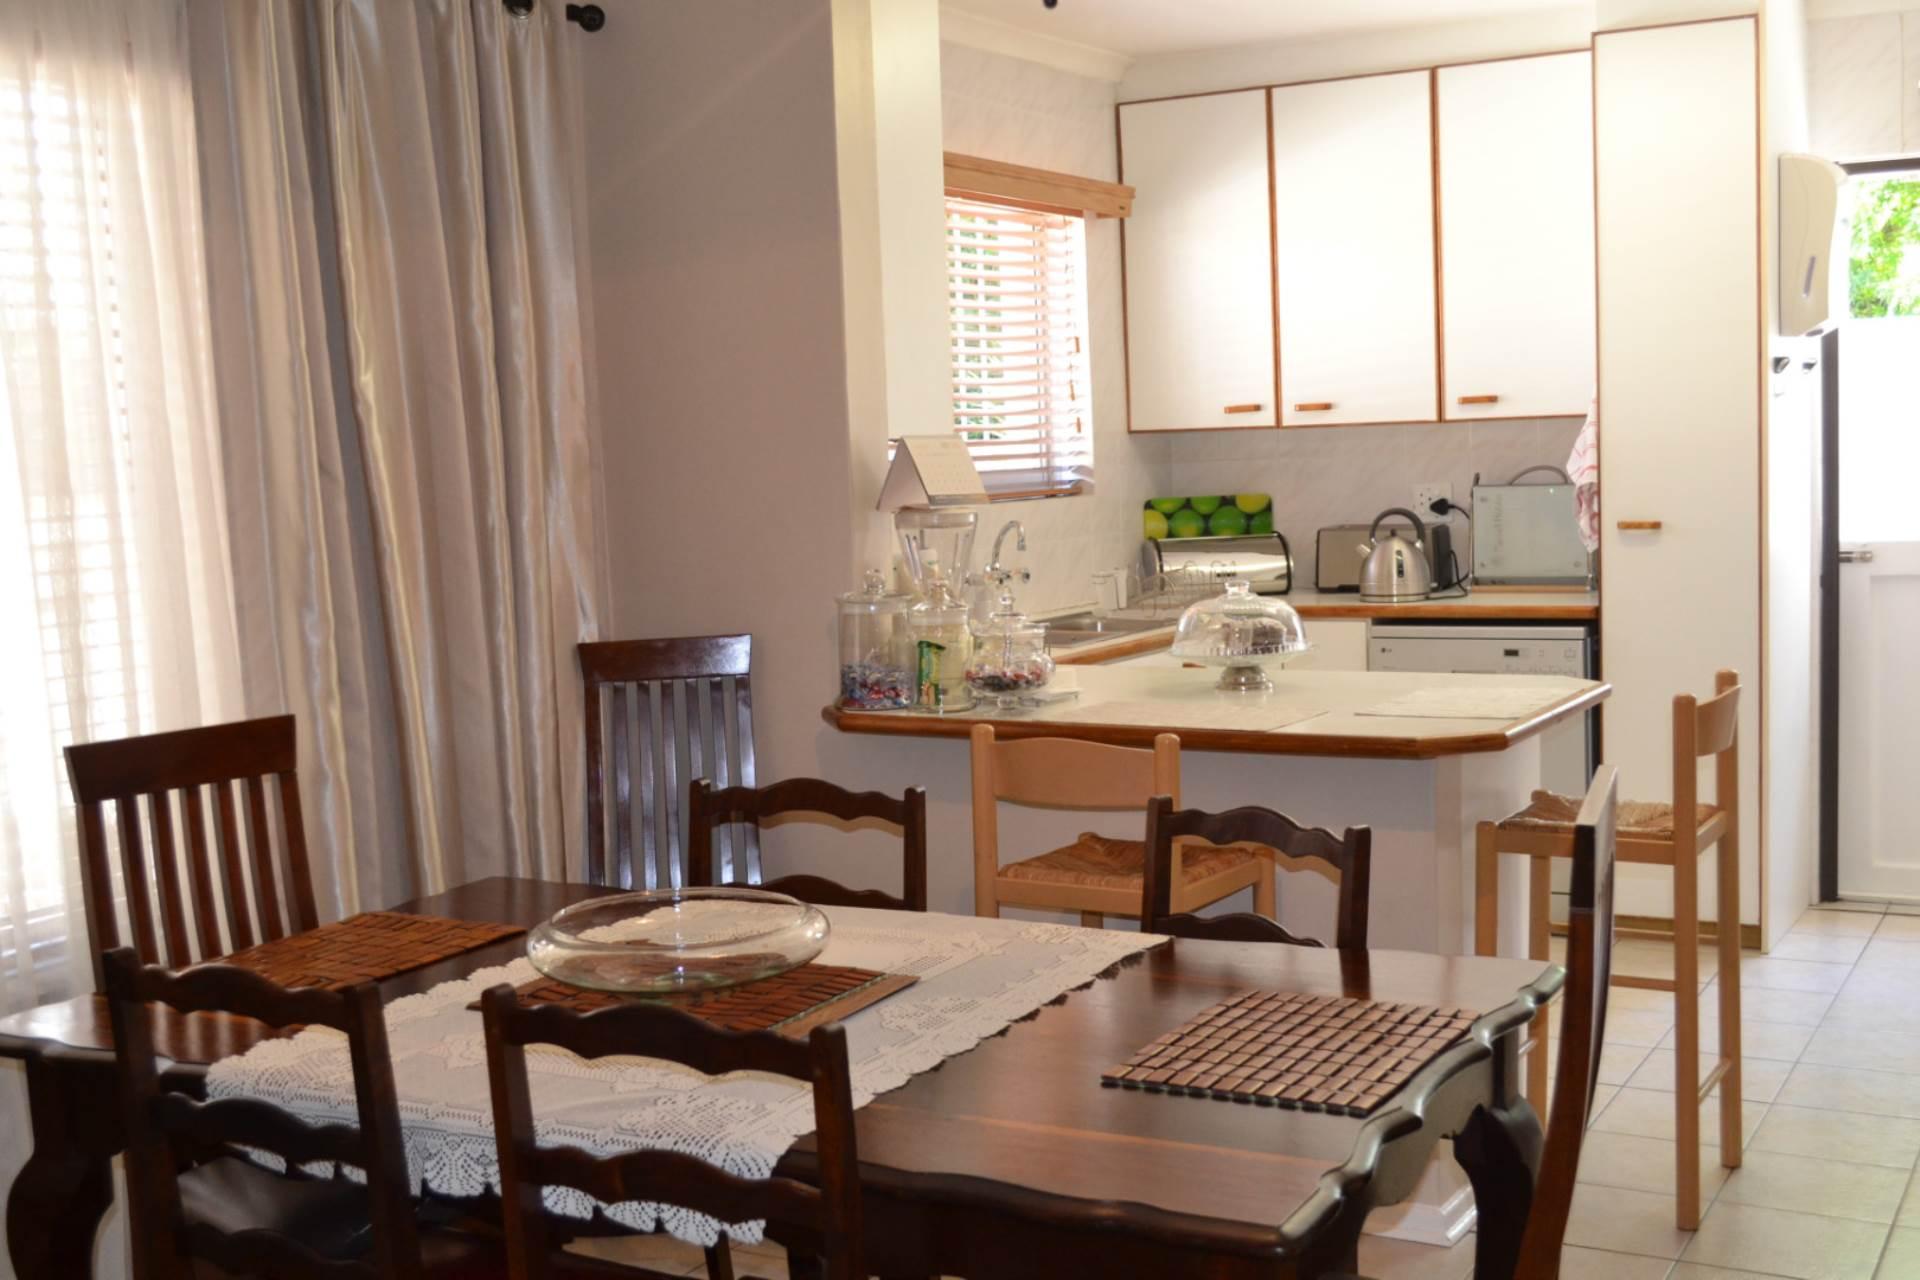 Townhouse For Sale In Loevenstein Bellville Western Cape R 2290000